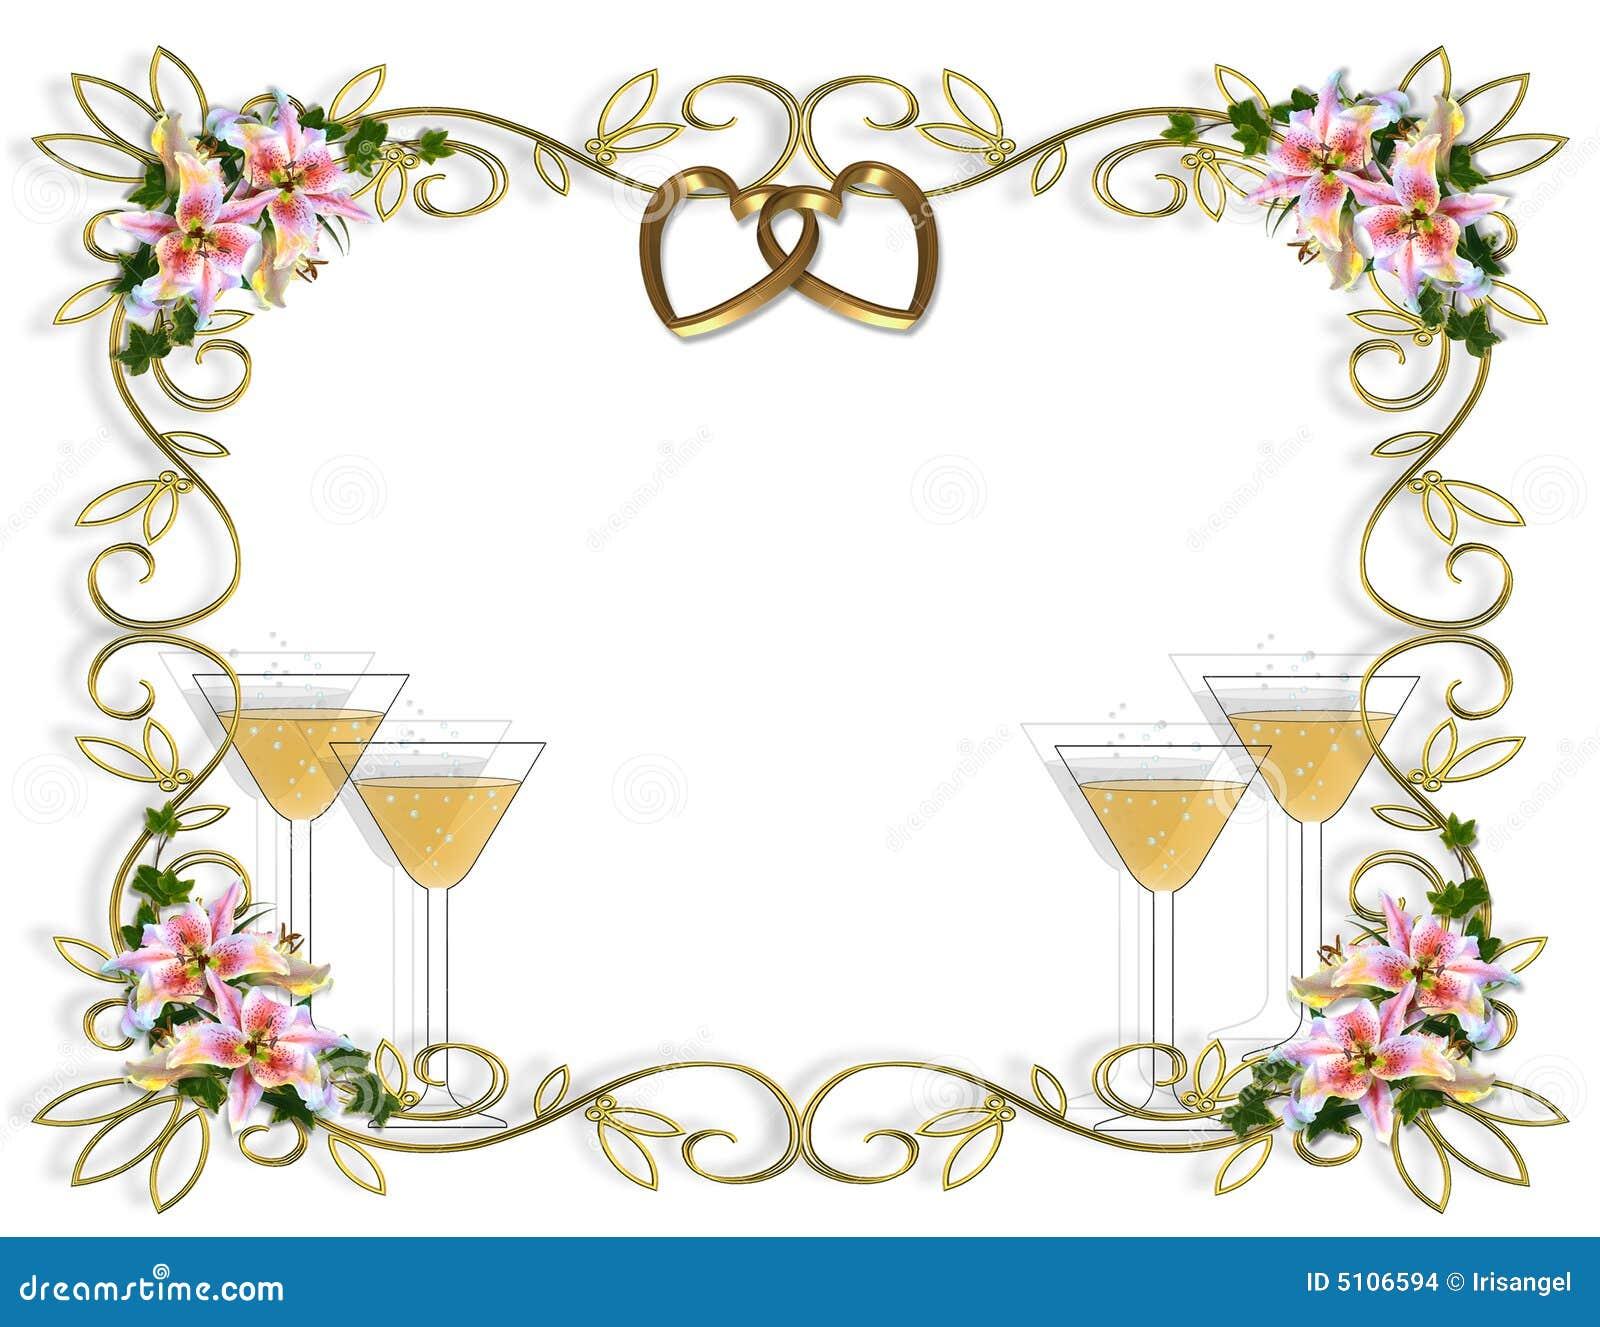 New Years Eve Invitation with good invitation design